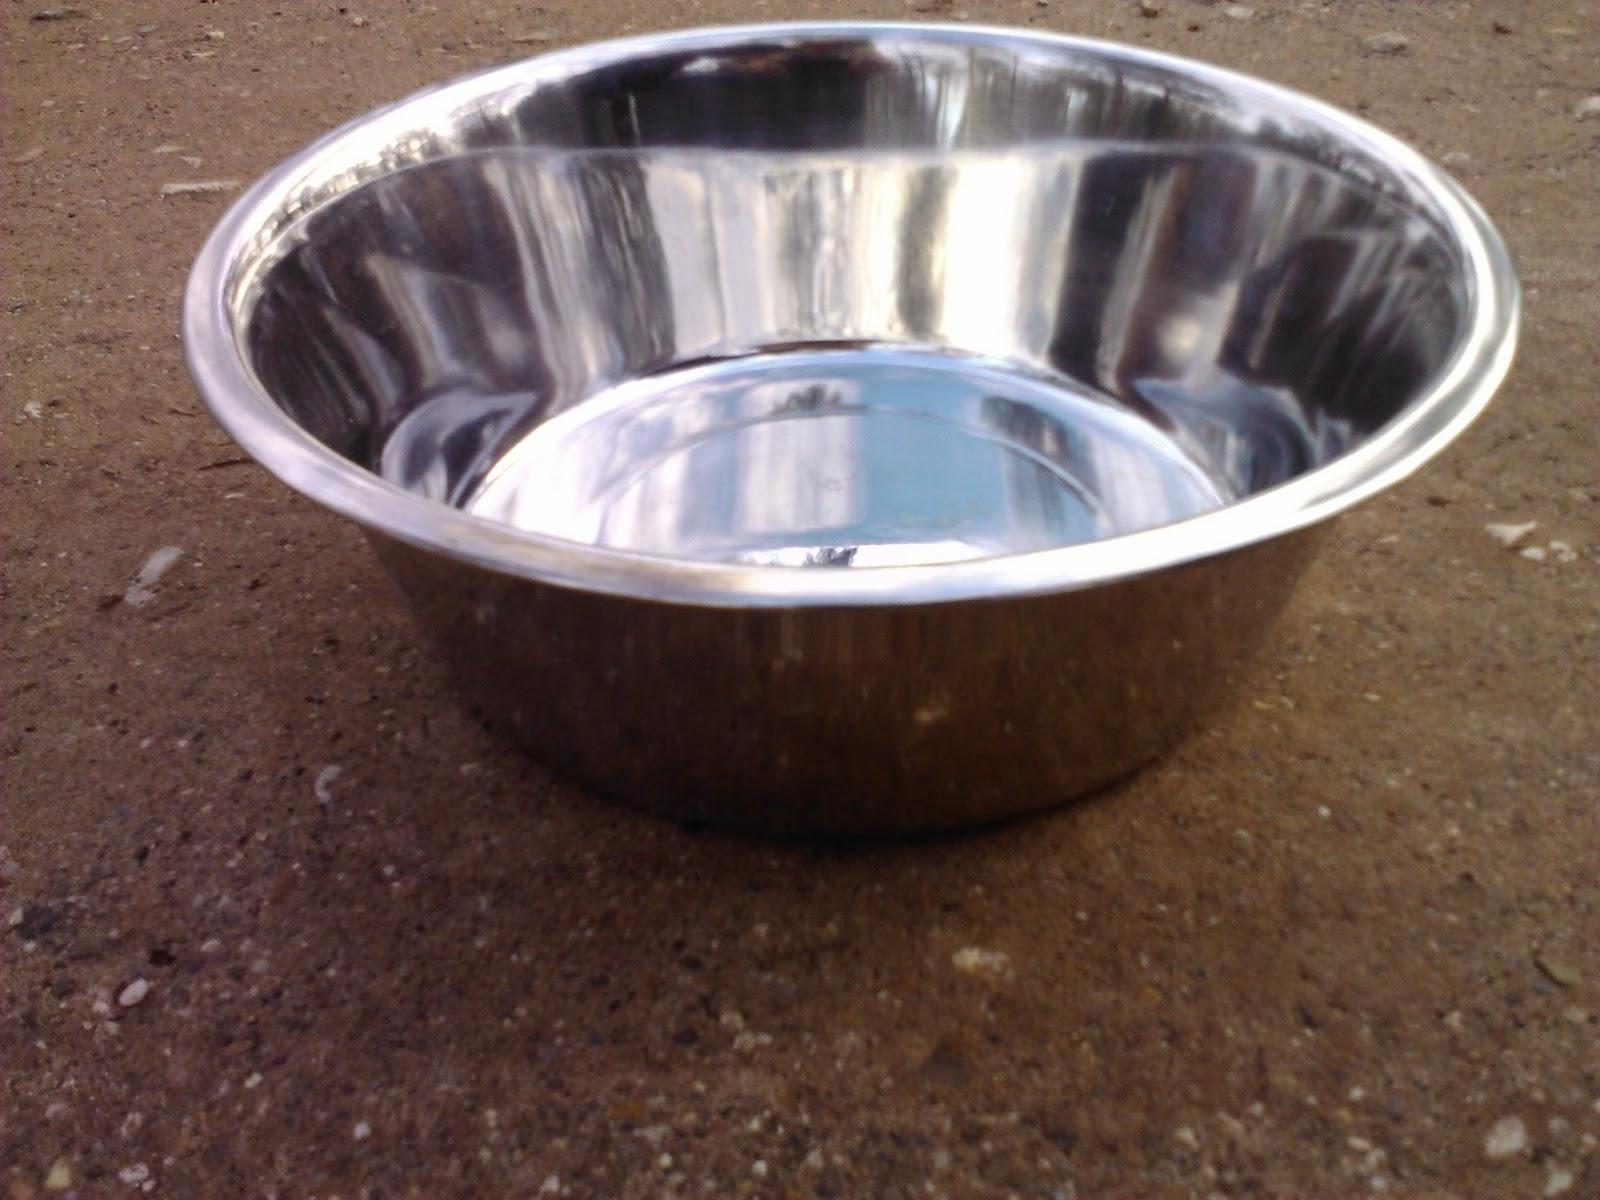 Matt Of All Trades: Dog's Water Bowl Is Fire Hazard